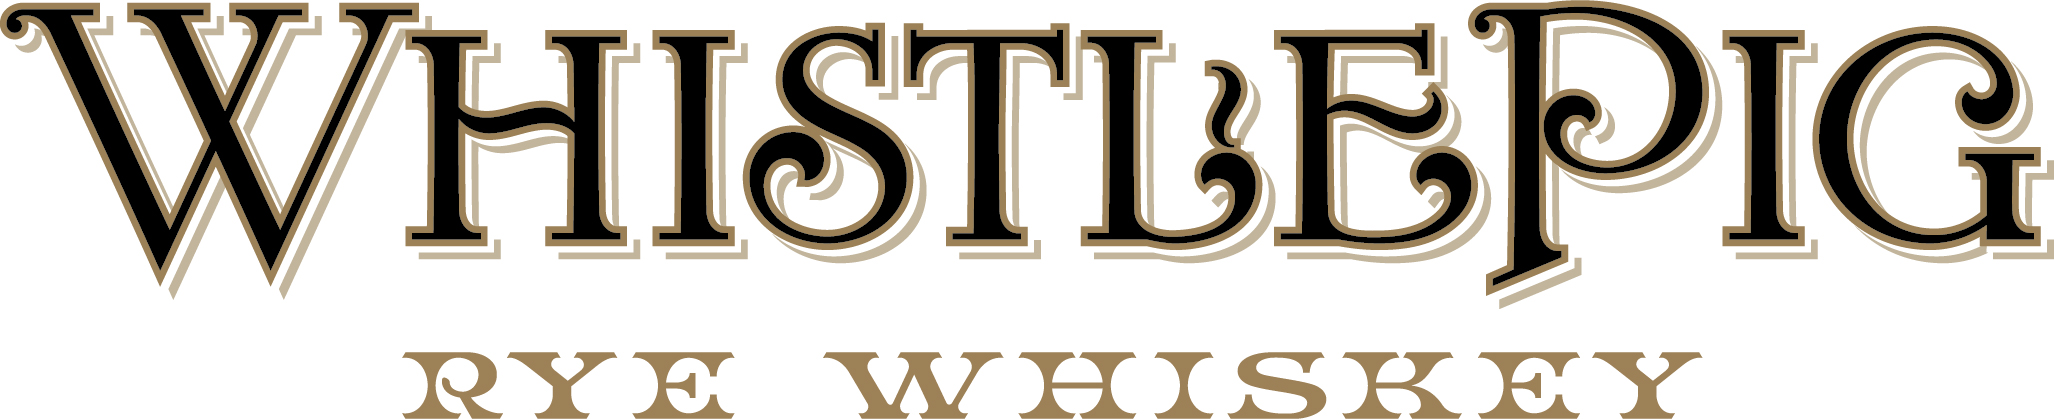 WhistlePig-rye-whiskey-black-tan-no-pig-updated-rye - Savannah Burnett.jpg